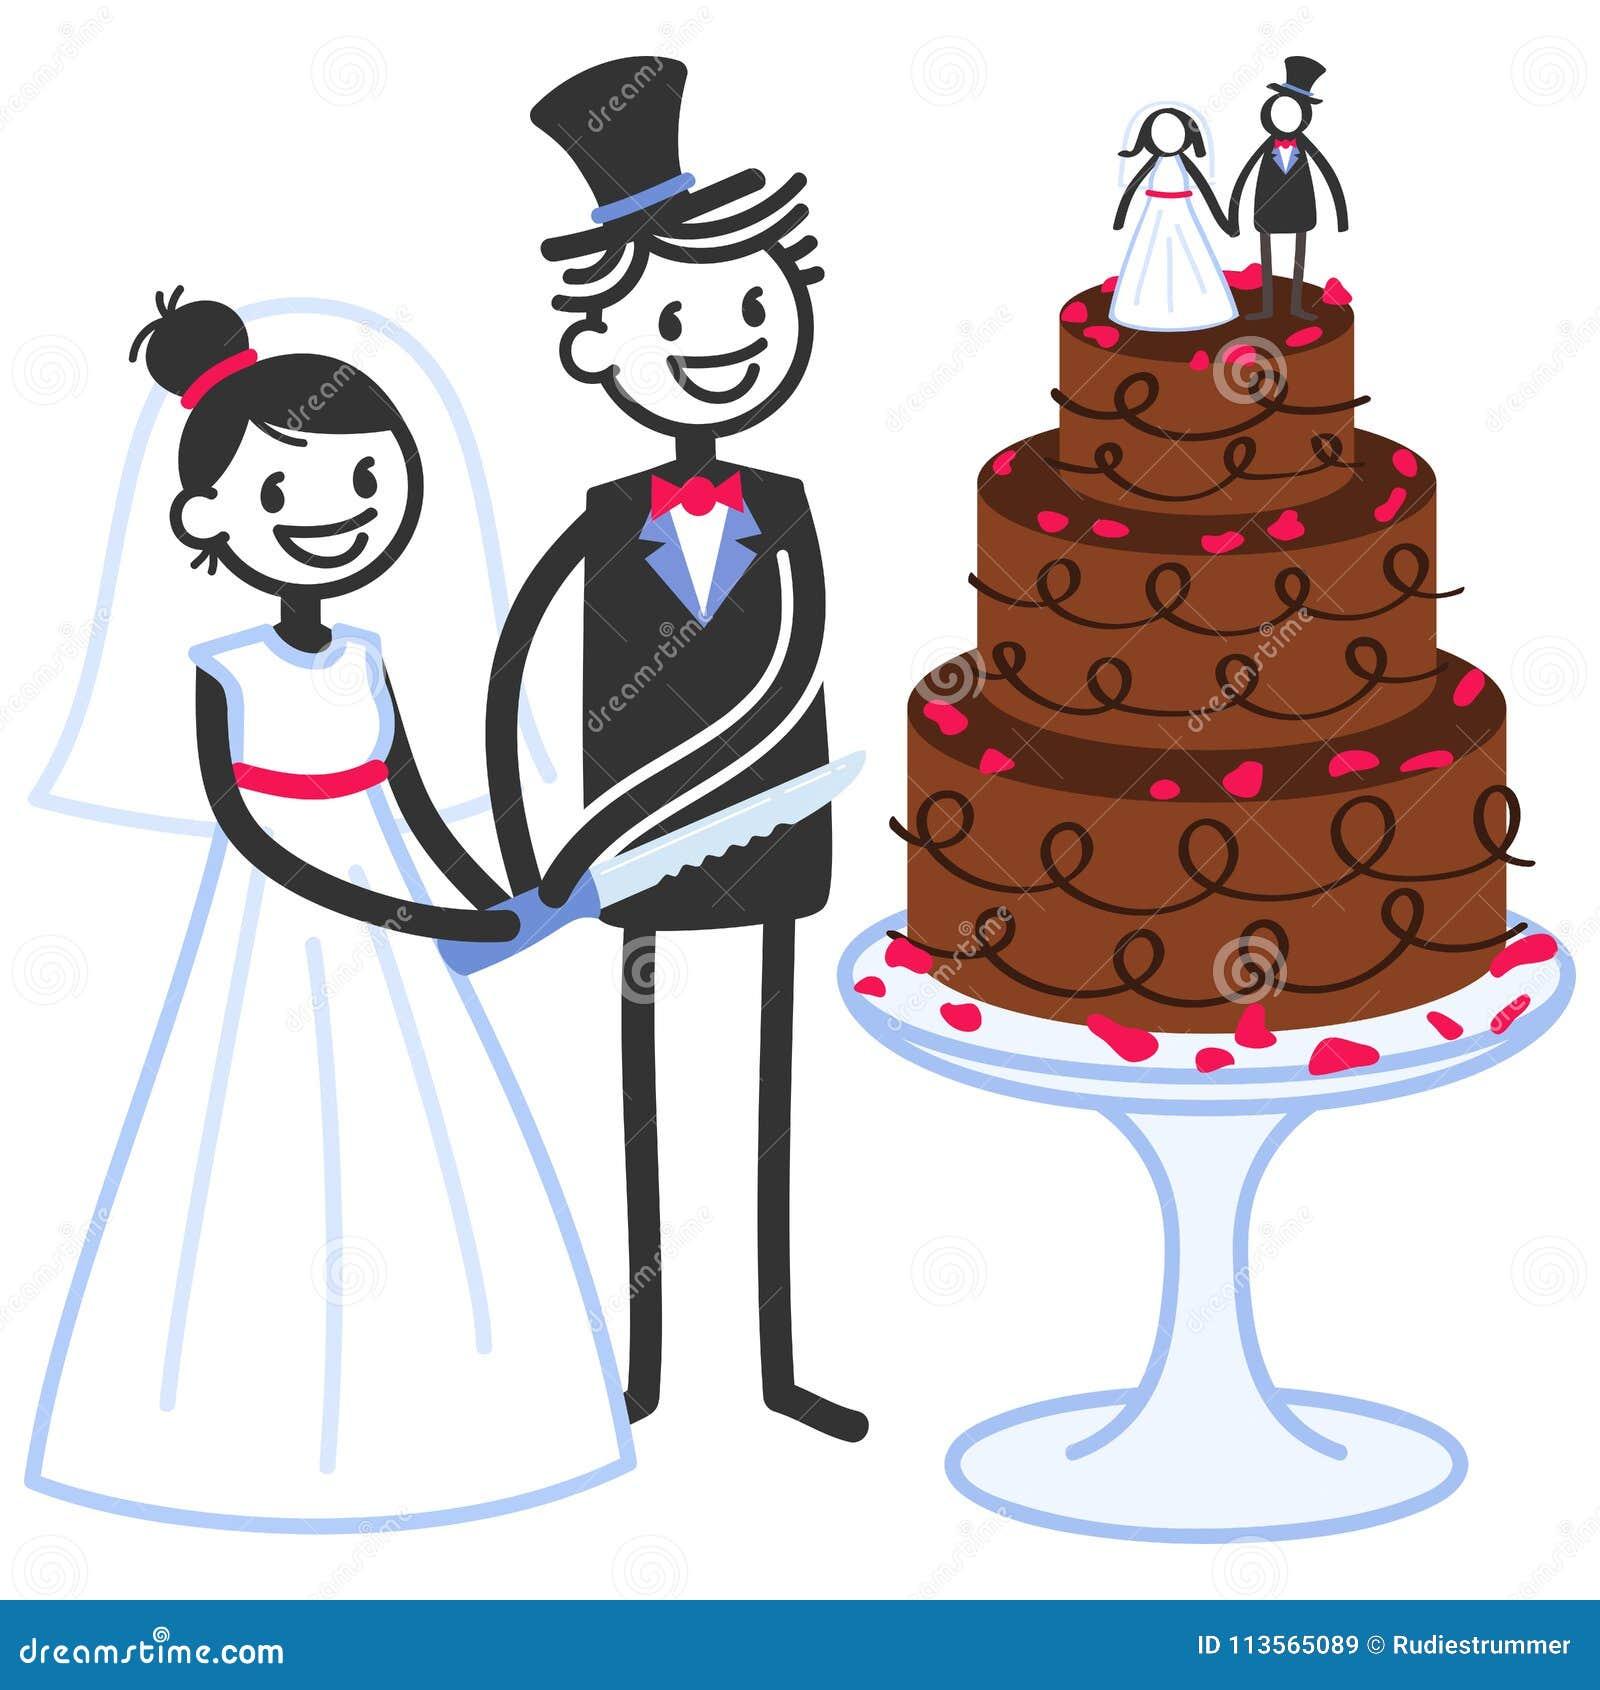 Vector Illustration Of Cute Stick Figures Bridal Couple